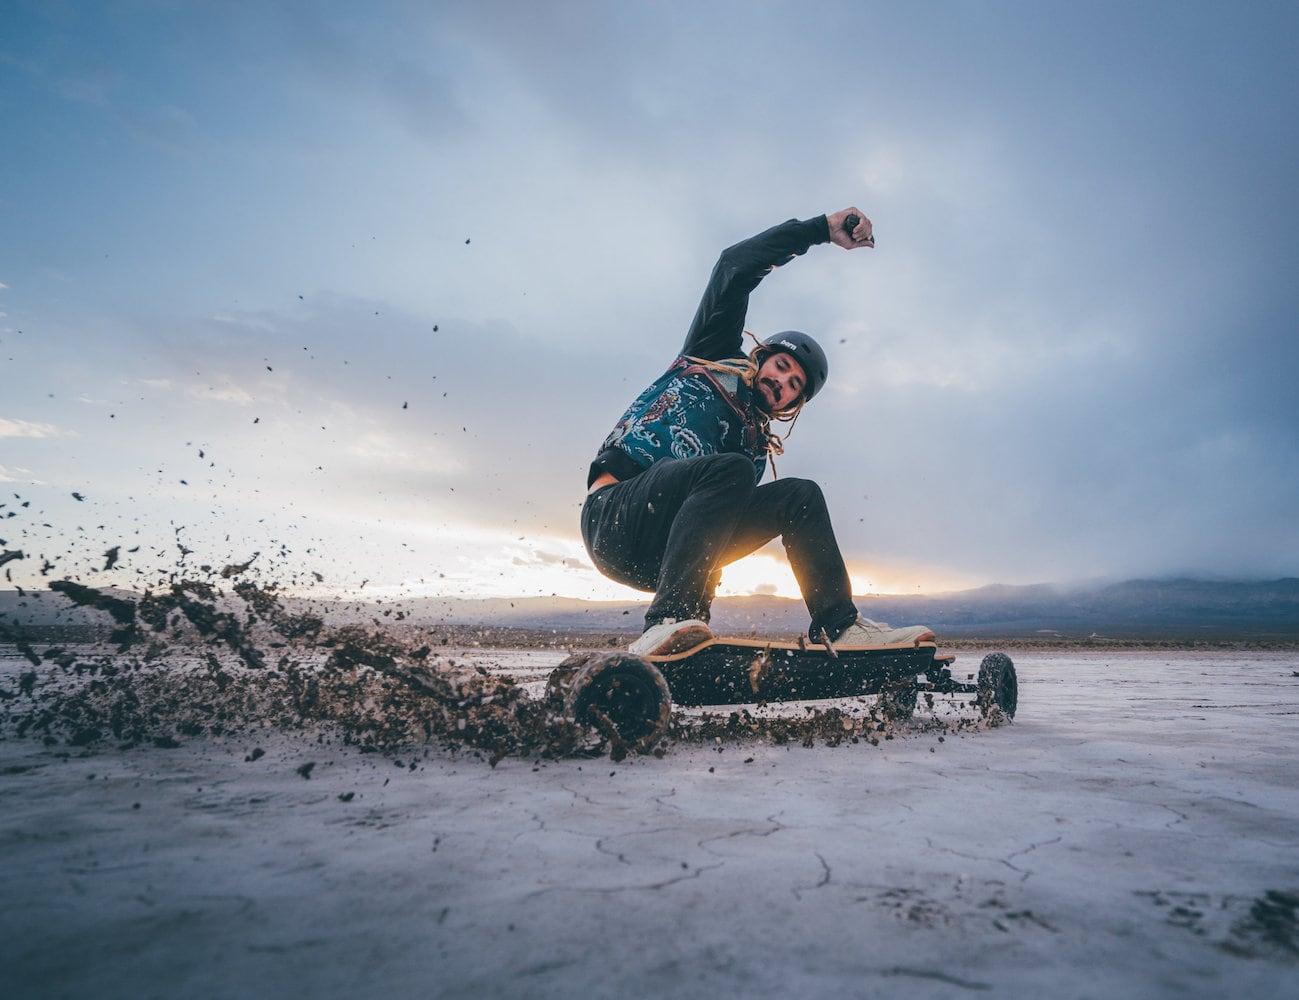 Evolve Bamboo GTR All-Terrain Electric Skateboard provides incredible flexibility and strength